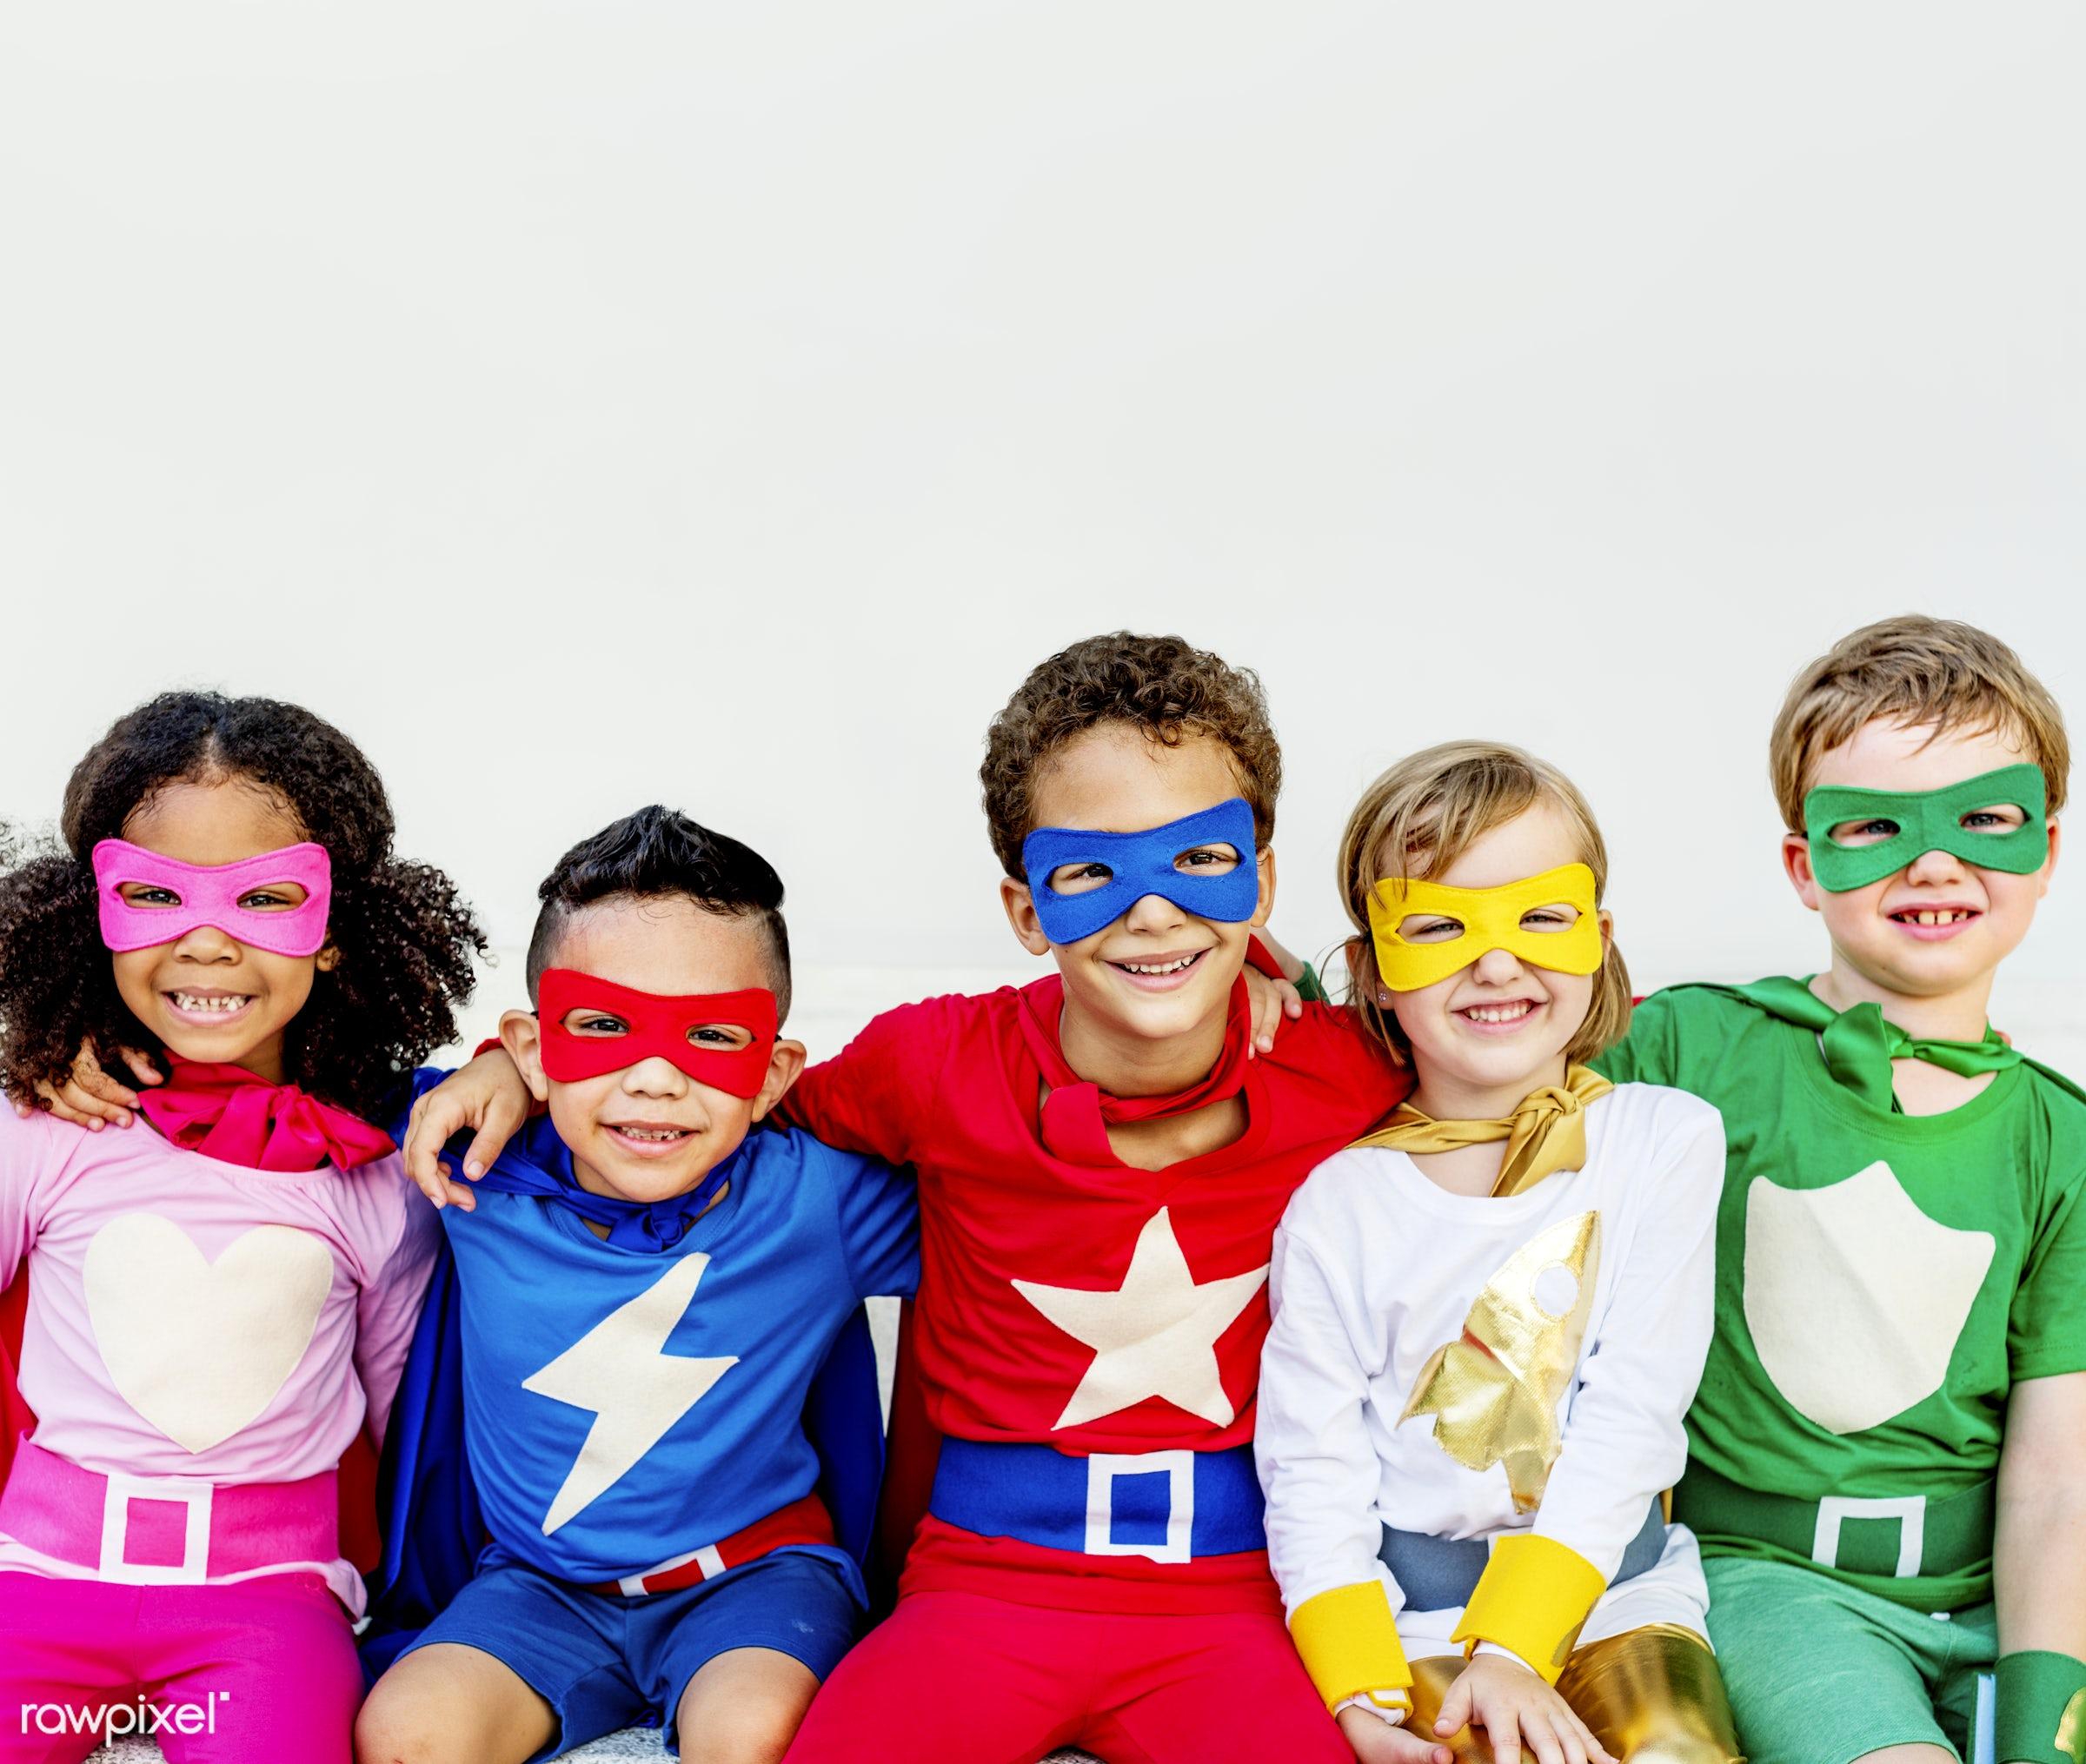 superhero, ambition, child, childhood, children, colorful, costume, diverse, diversity, dreams, friends, friendship, fun,...